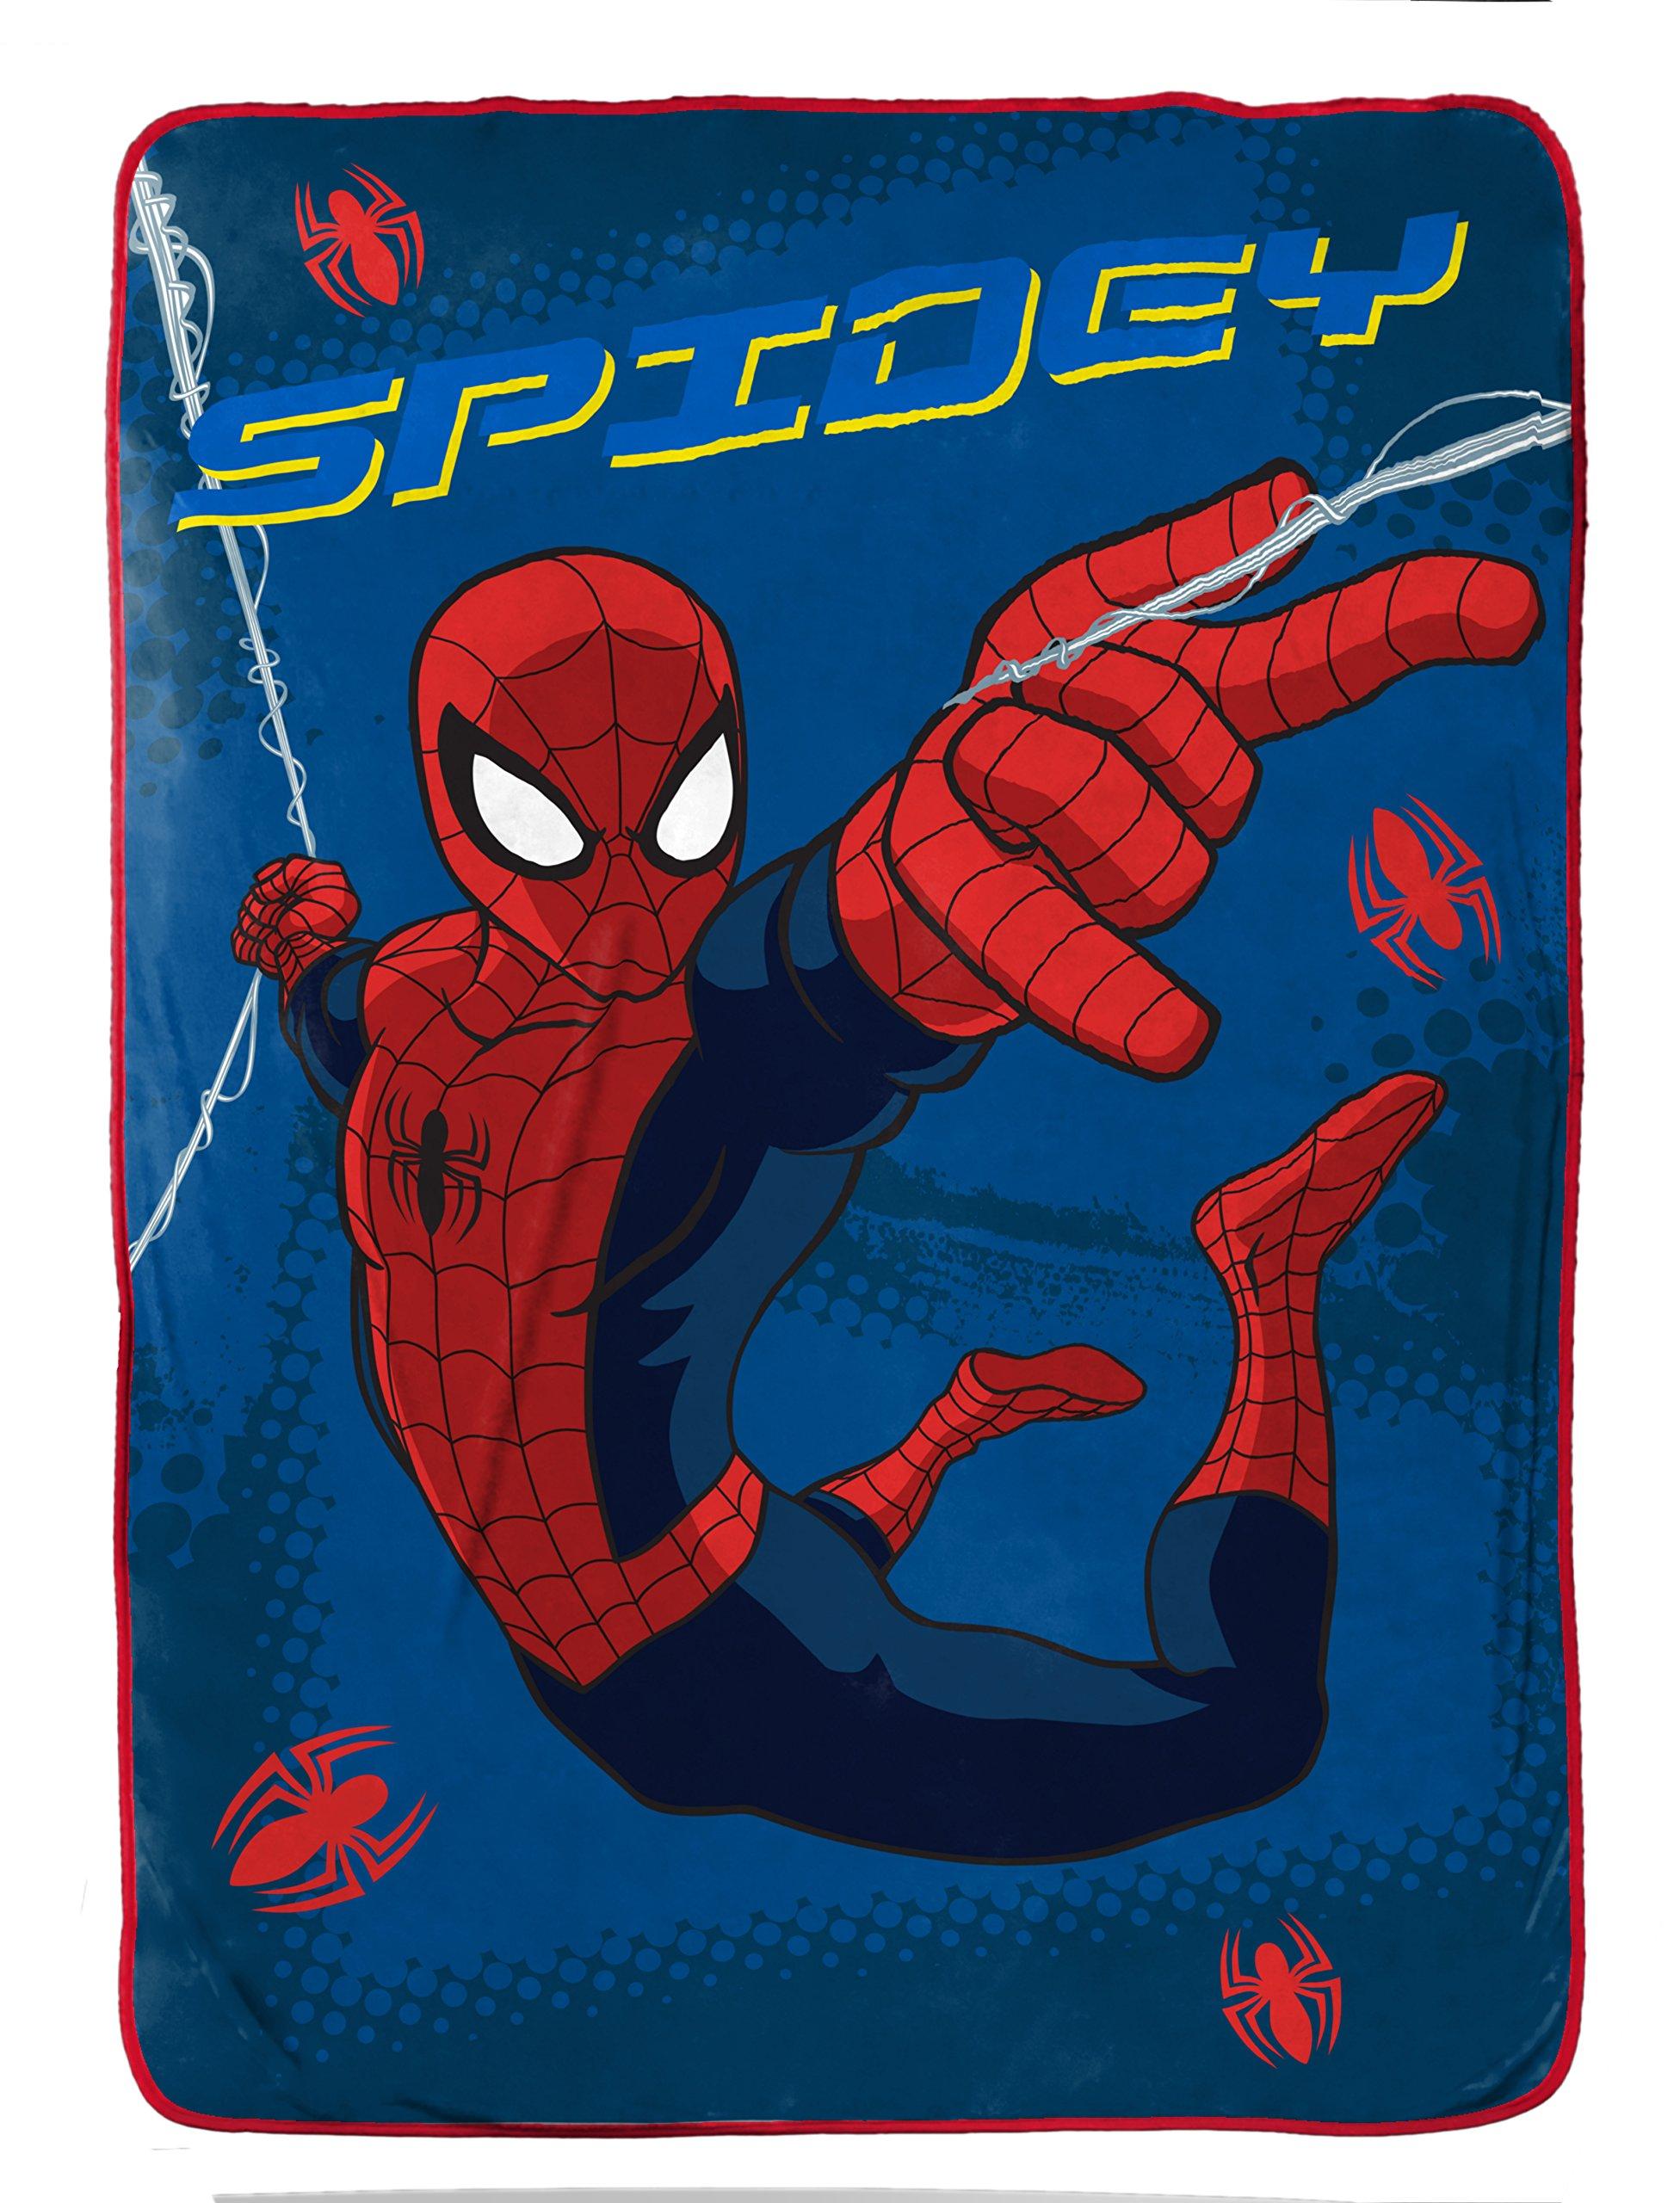 Marvel Spiderman 'Graphic' Plush Fleece 62'' x 90'' Twin Blanket